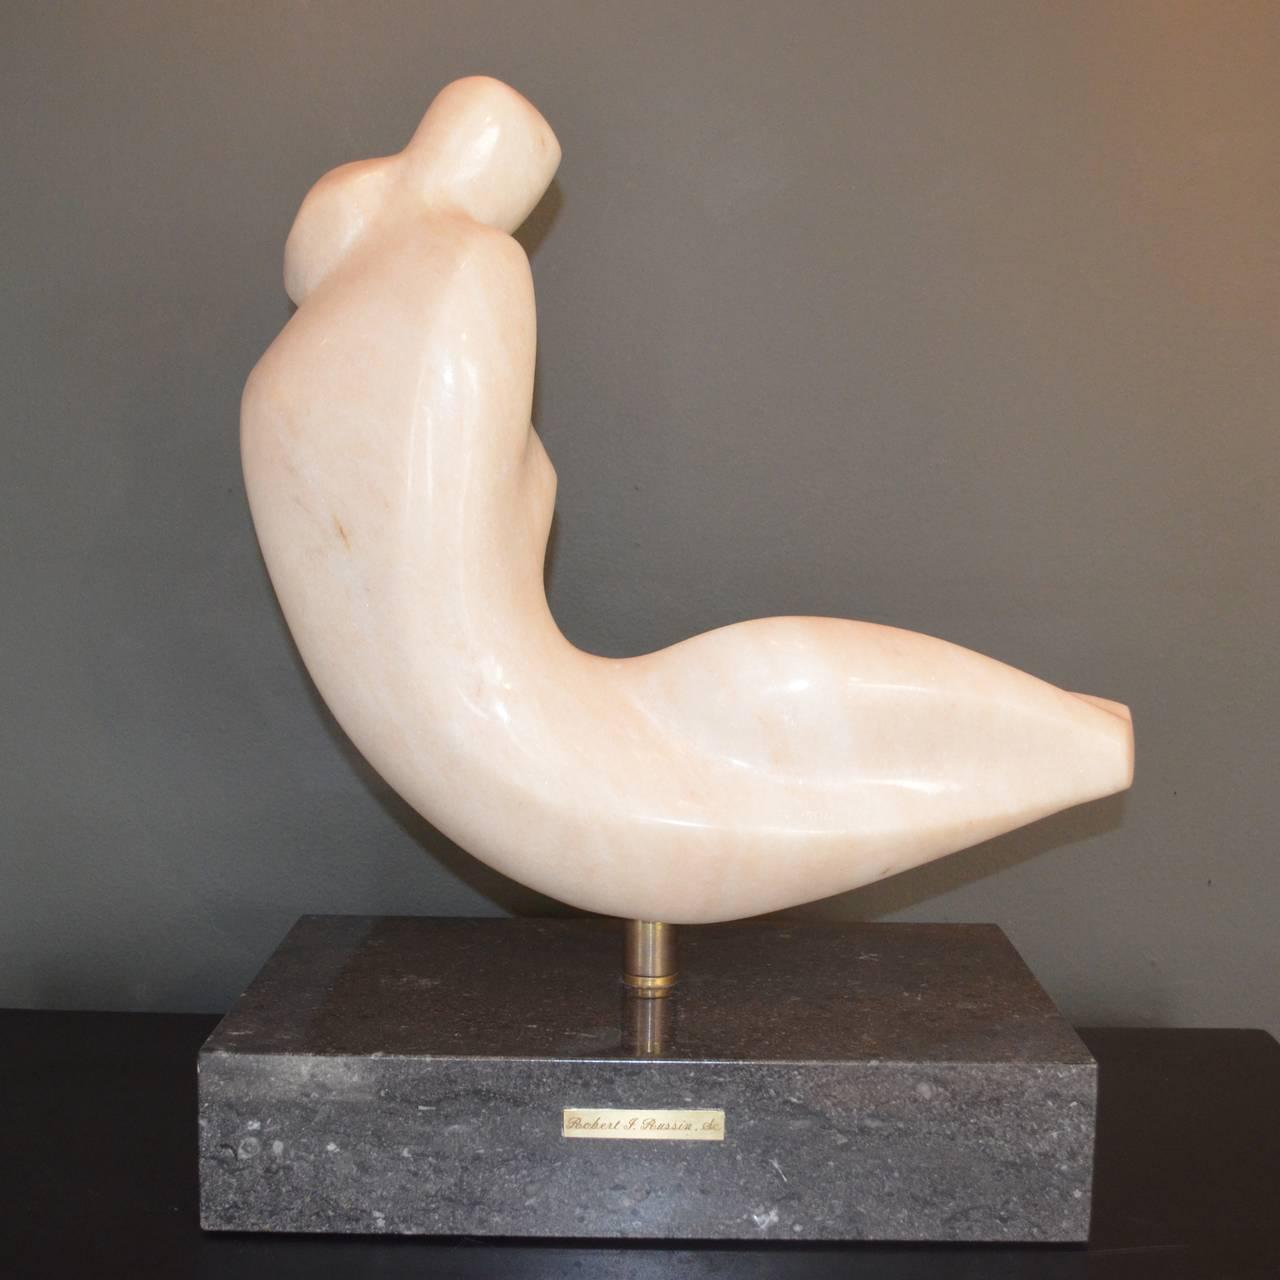 How Fair is Thy Love - Sculpture by Robert Russin